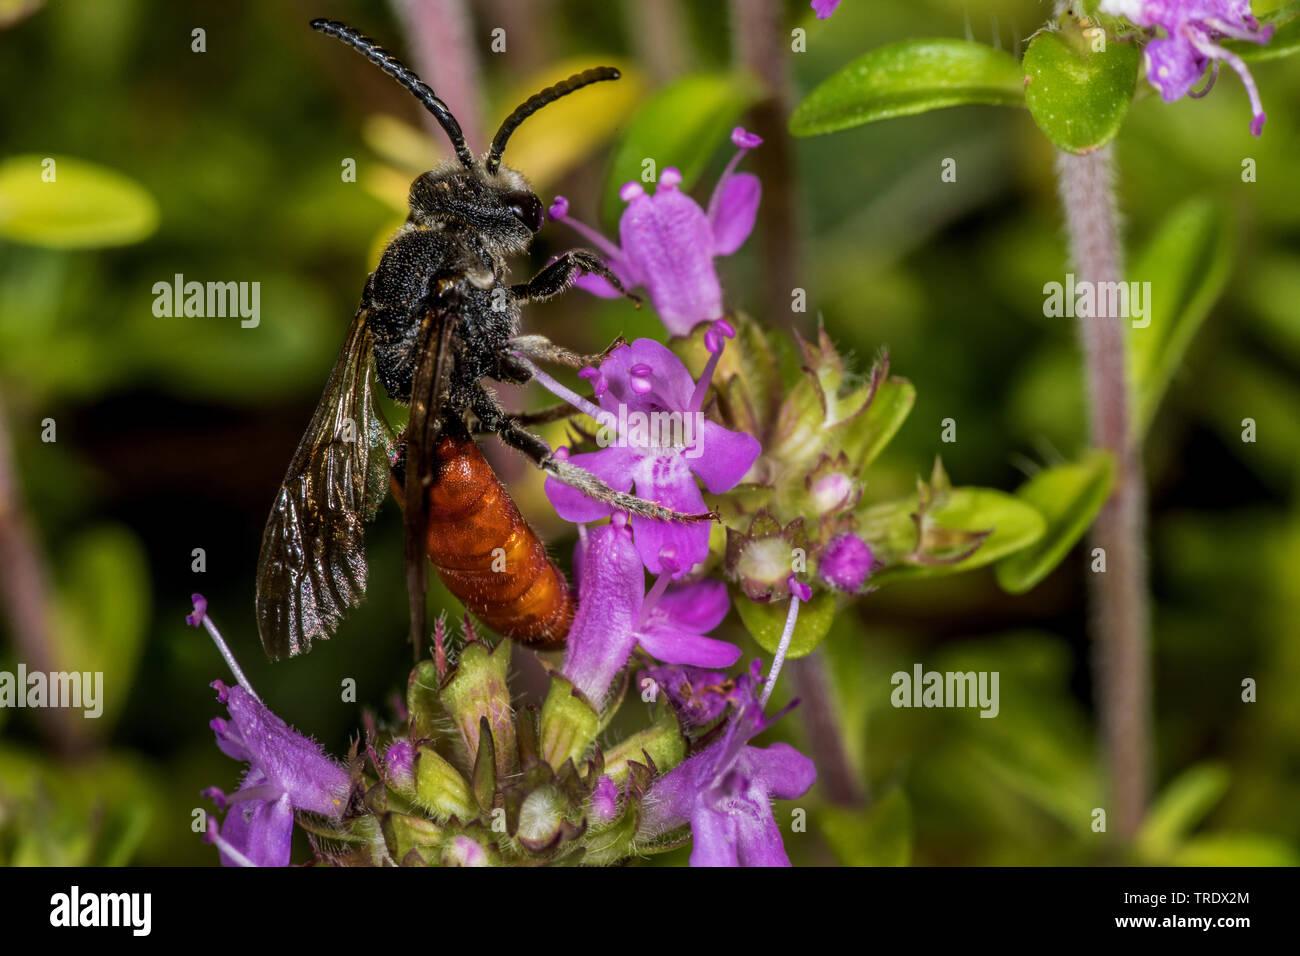 Grosse Blutbiene, Riesen-Blutbiene, Riesenblutbiene, Auen-Buckelbiene, Auenbuckelbiene (Sphecodes albilabris, Sphecodes fuscipennis), sitzt an Blueten - Stock Image